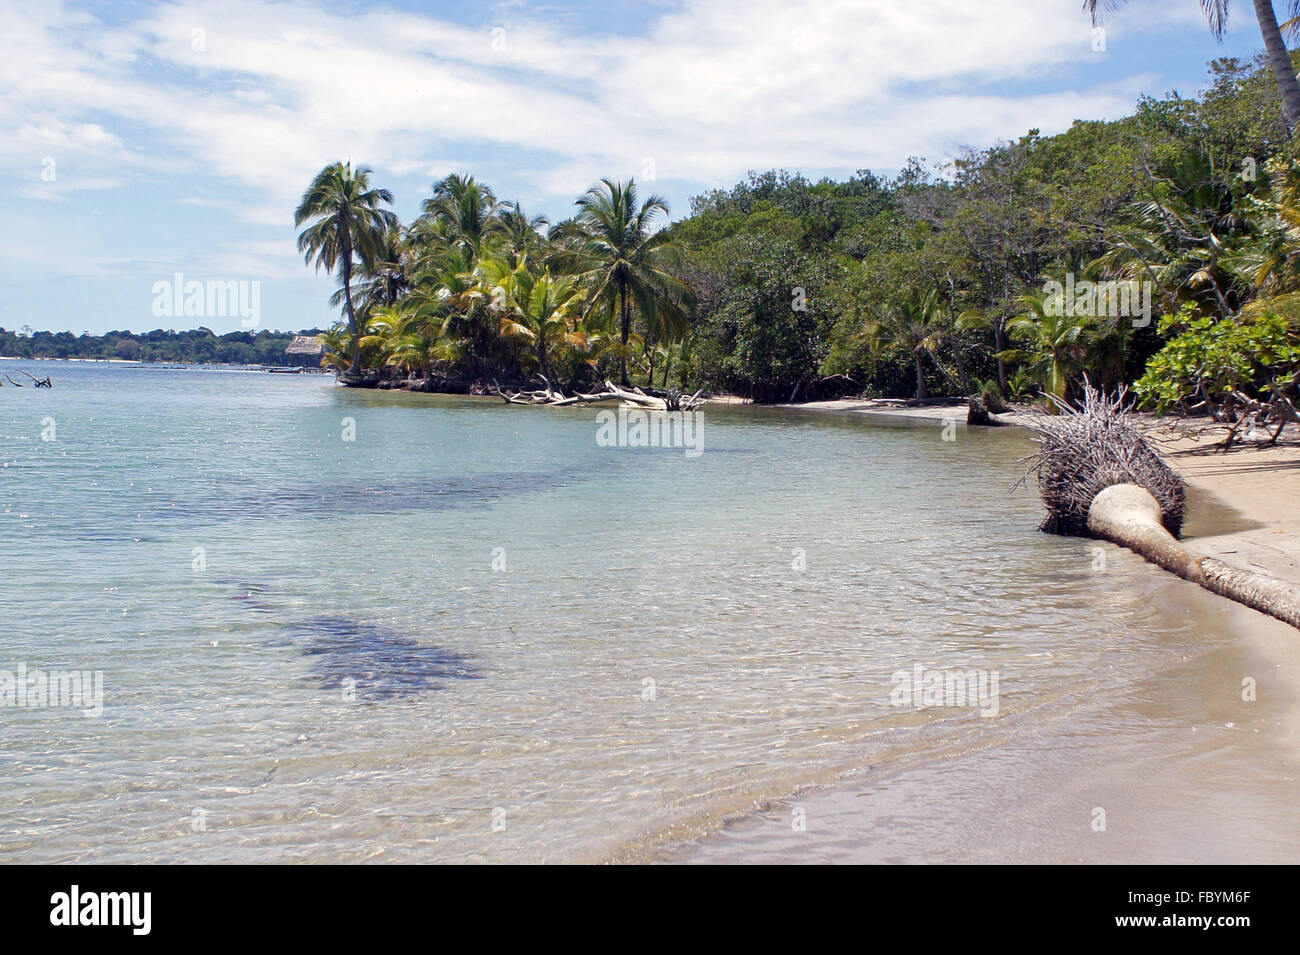 caribbean beach - Stock Image